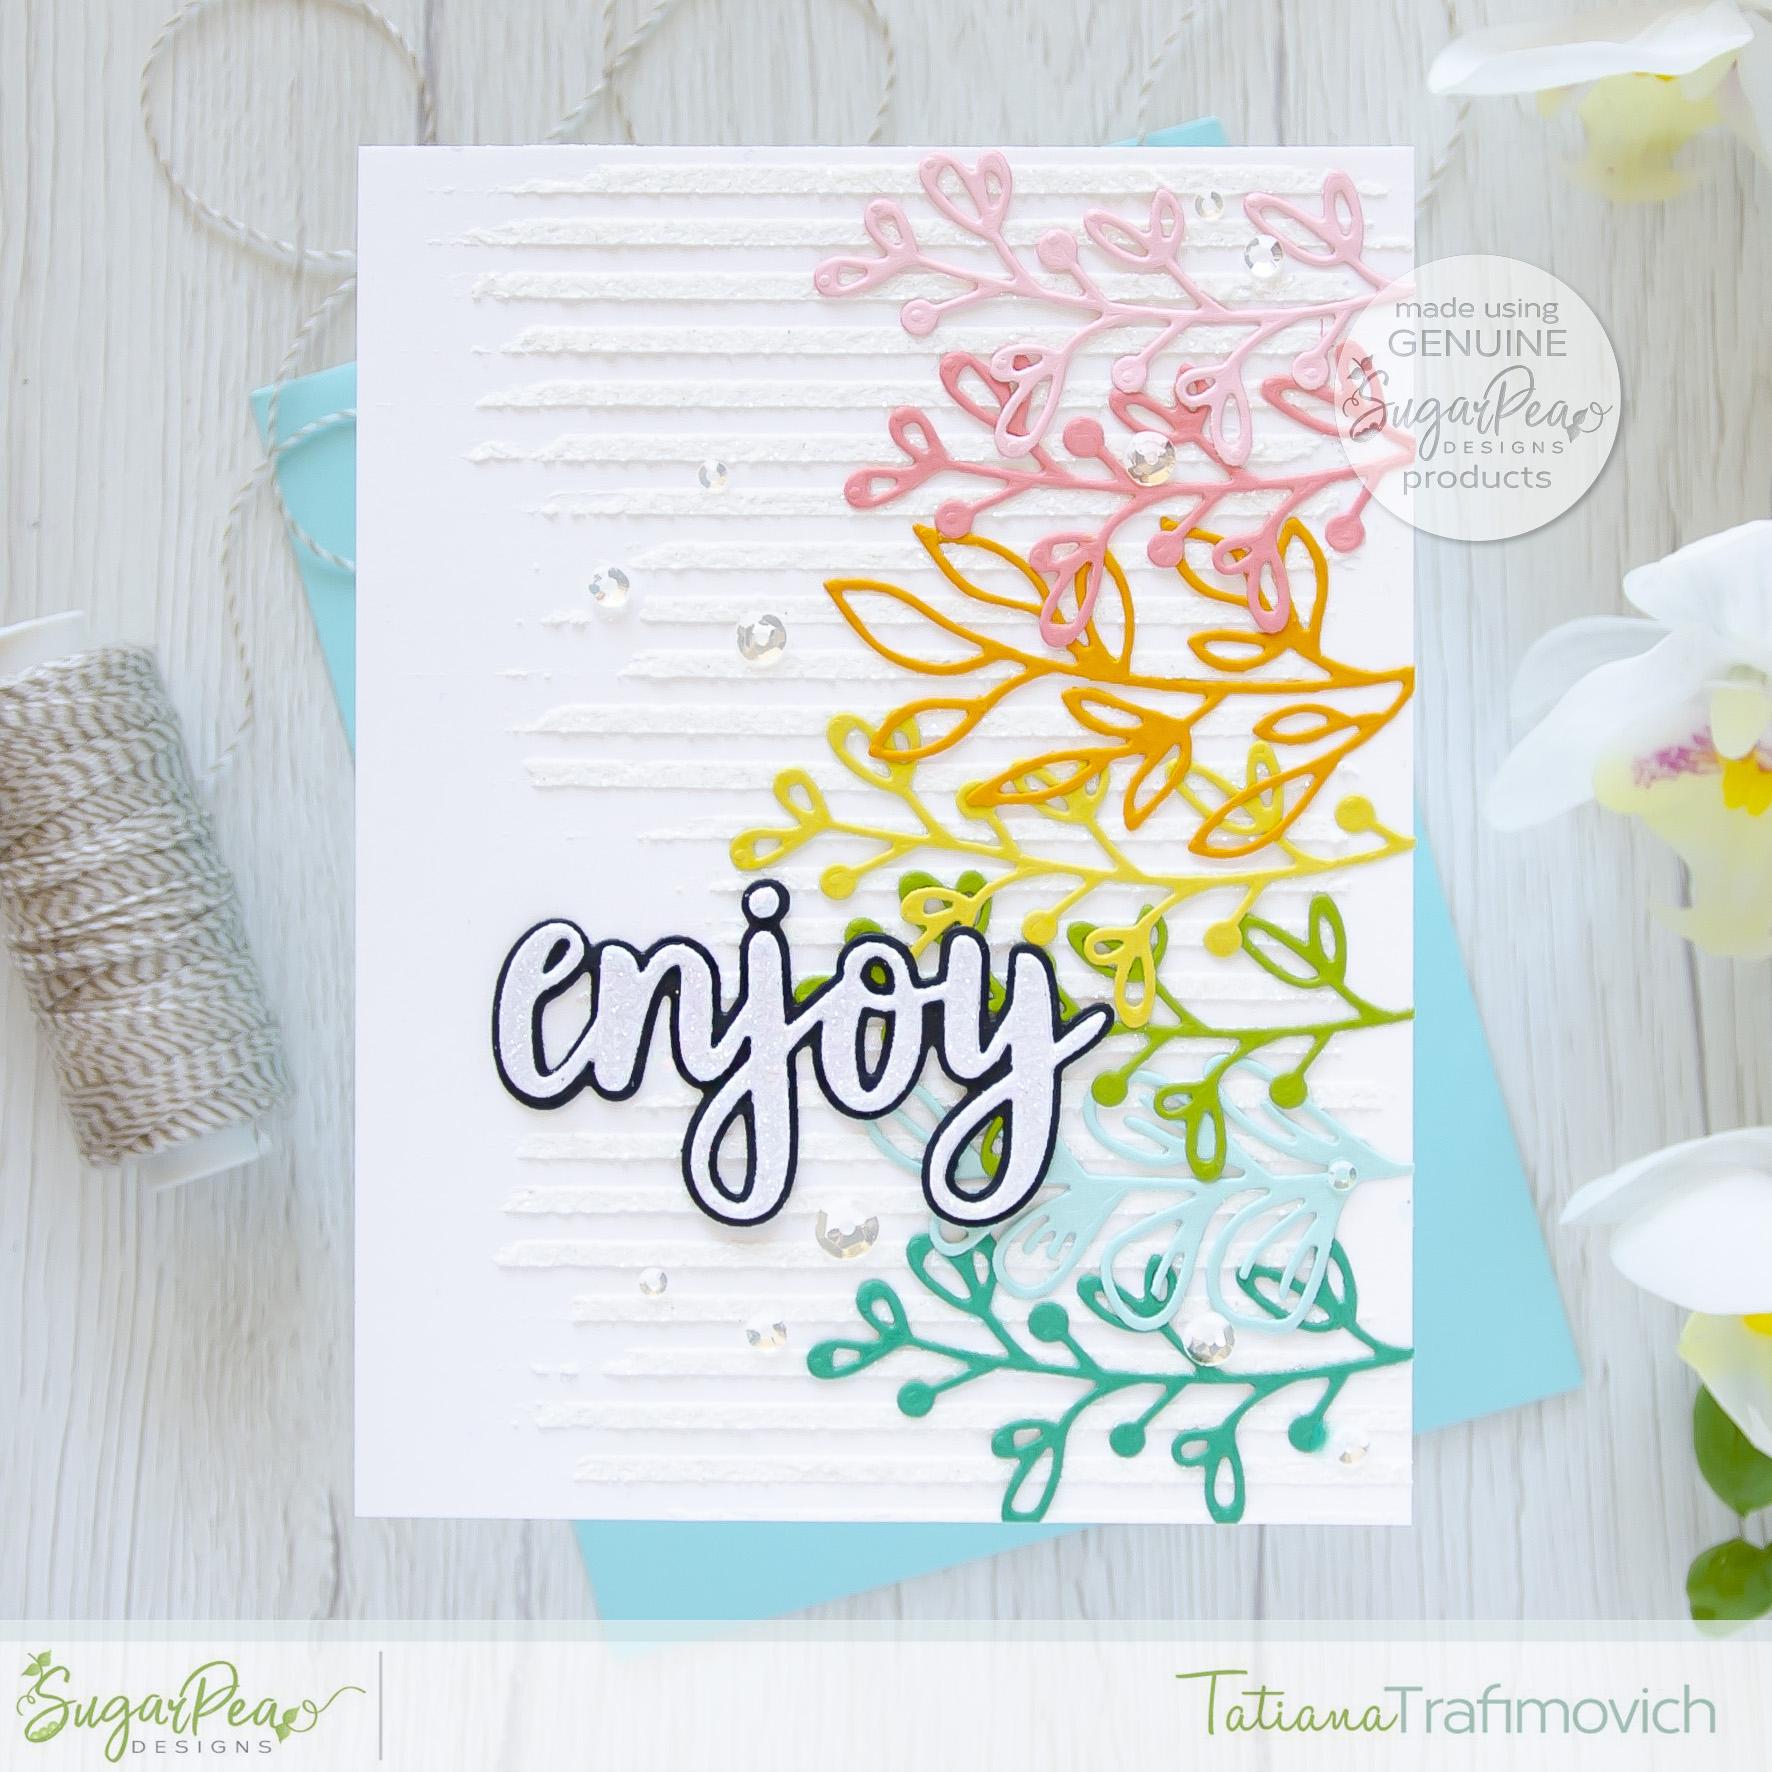 Enjoy #handmade card by Tatiana Trafimovich #tatianacraftandart - Botanical Brunches Die by SugarPea Designs #sugarpeadesigns